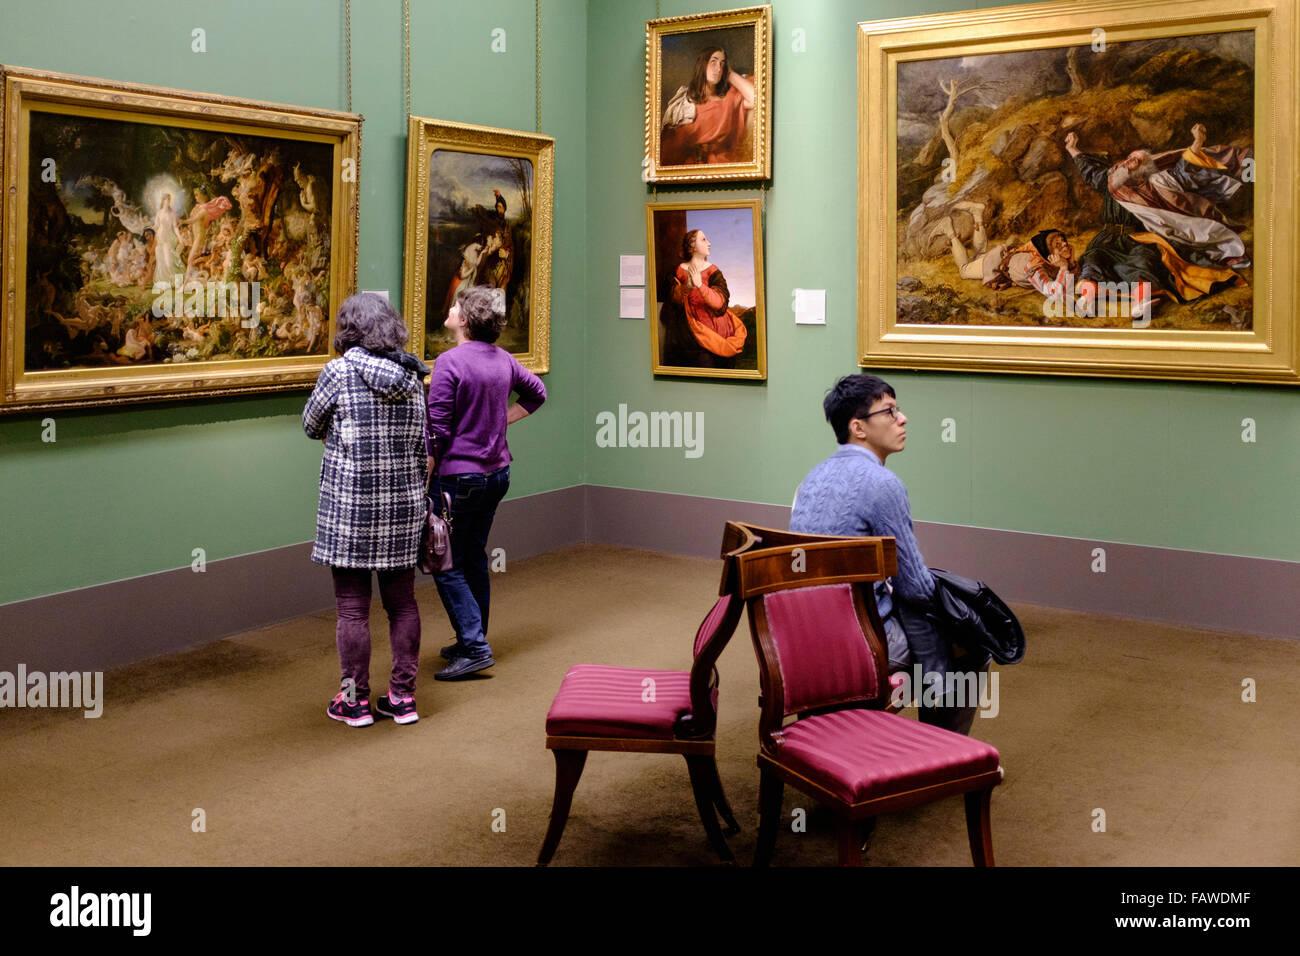 Interior of Scottish National Gallery art museum in Edinburgh Scotland United Kingdom - Stock Image